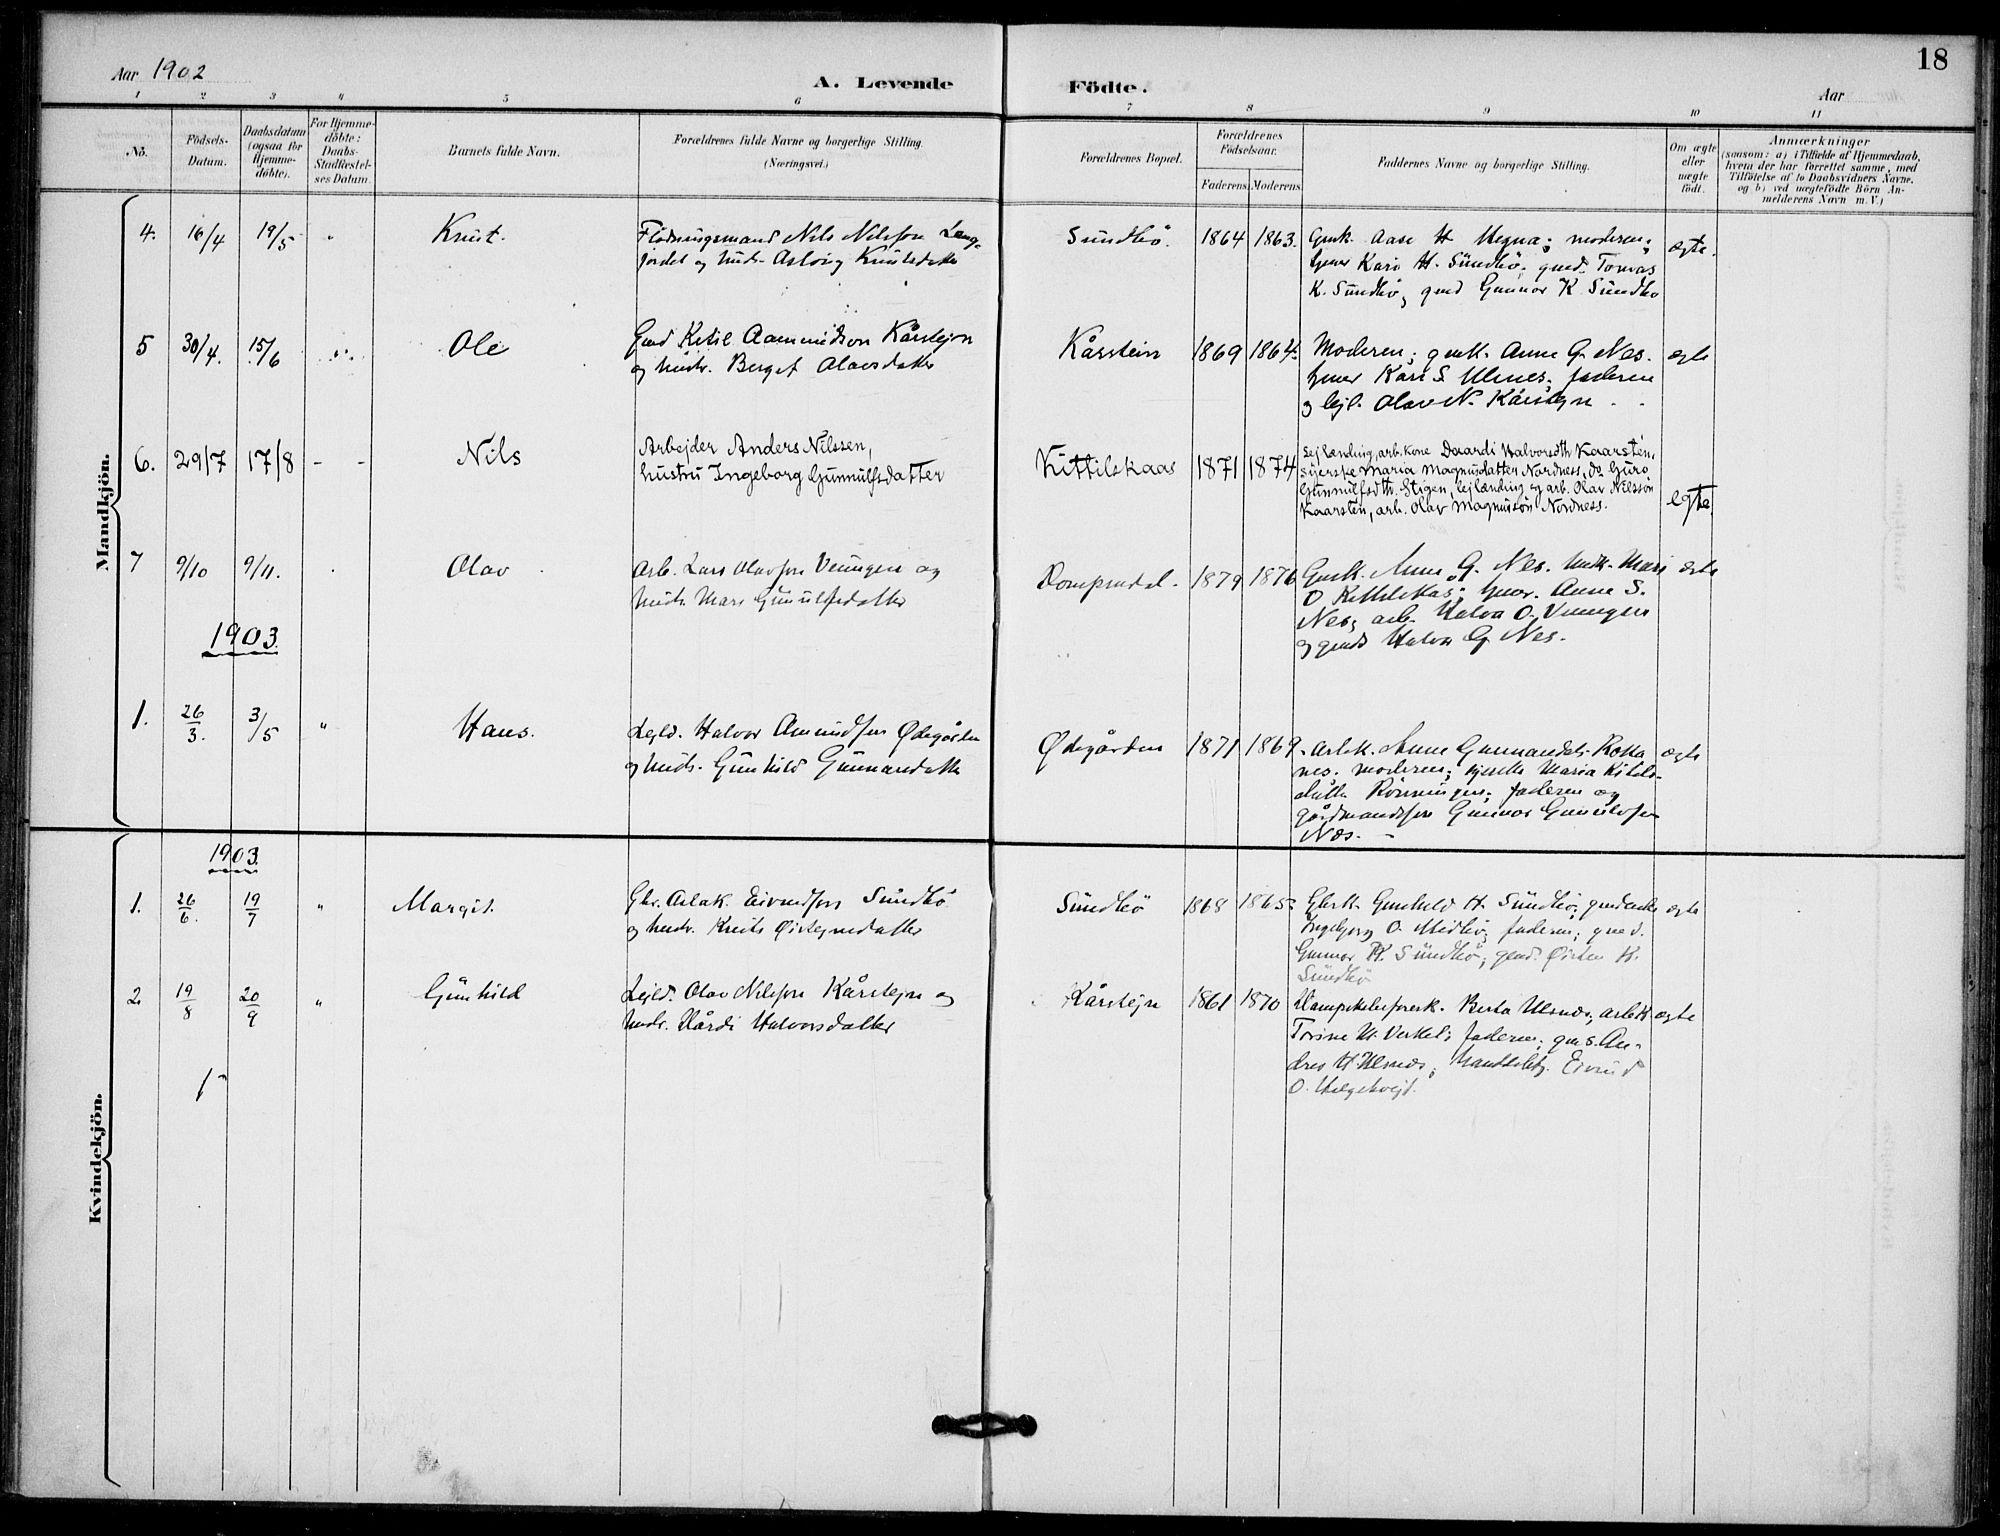 SAKO, Lunde kirkebøker, F/Fb/L0004: Ministerialbok nr. II 4, 1892-1907, s. 18